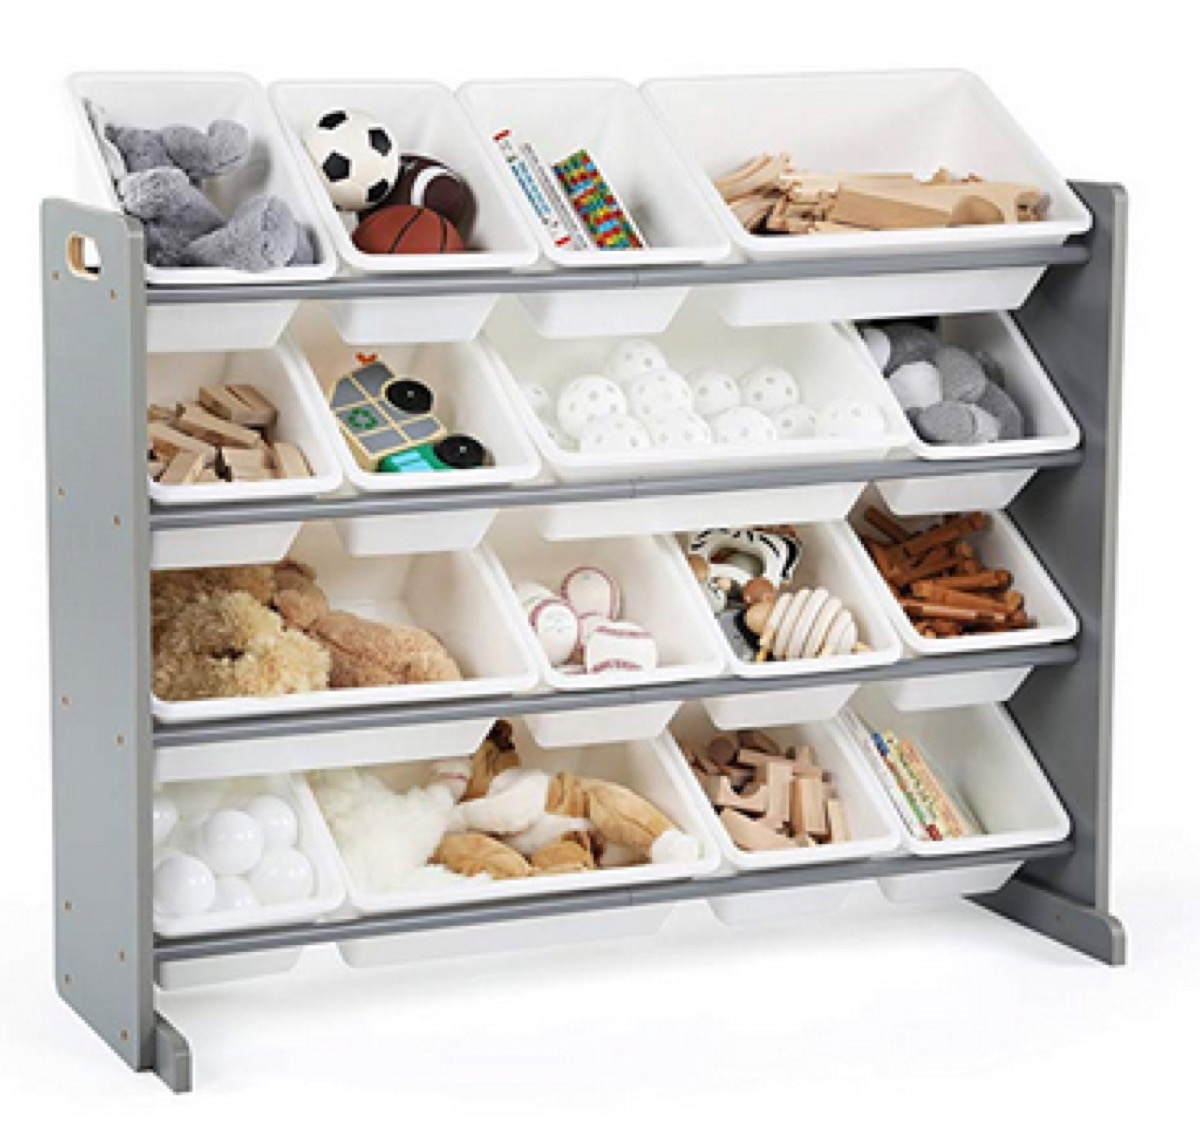 storage rack with white bins